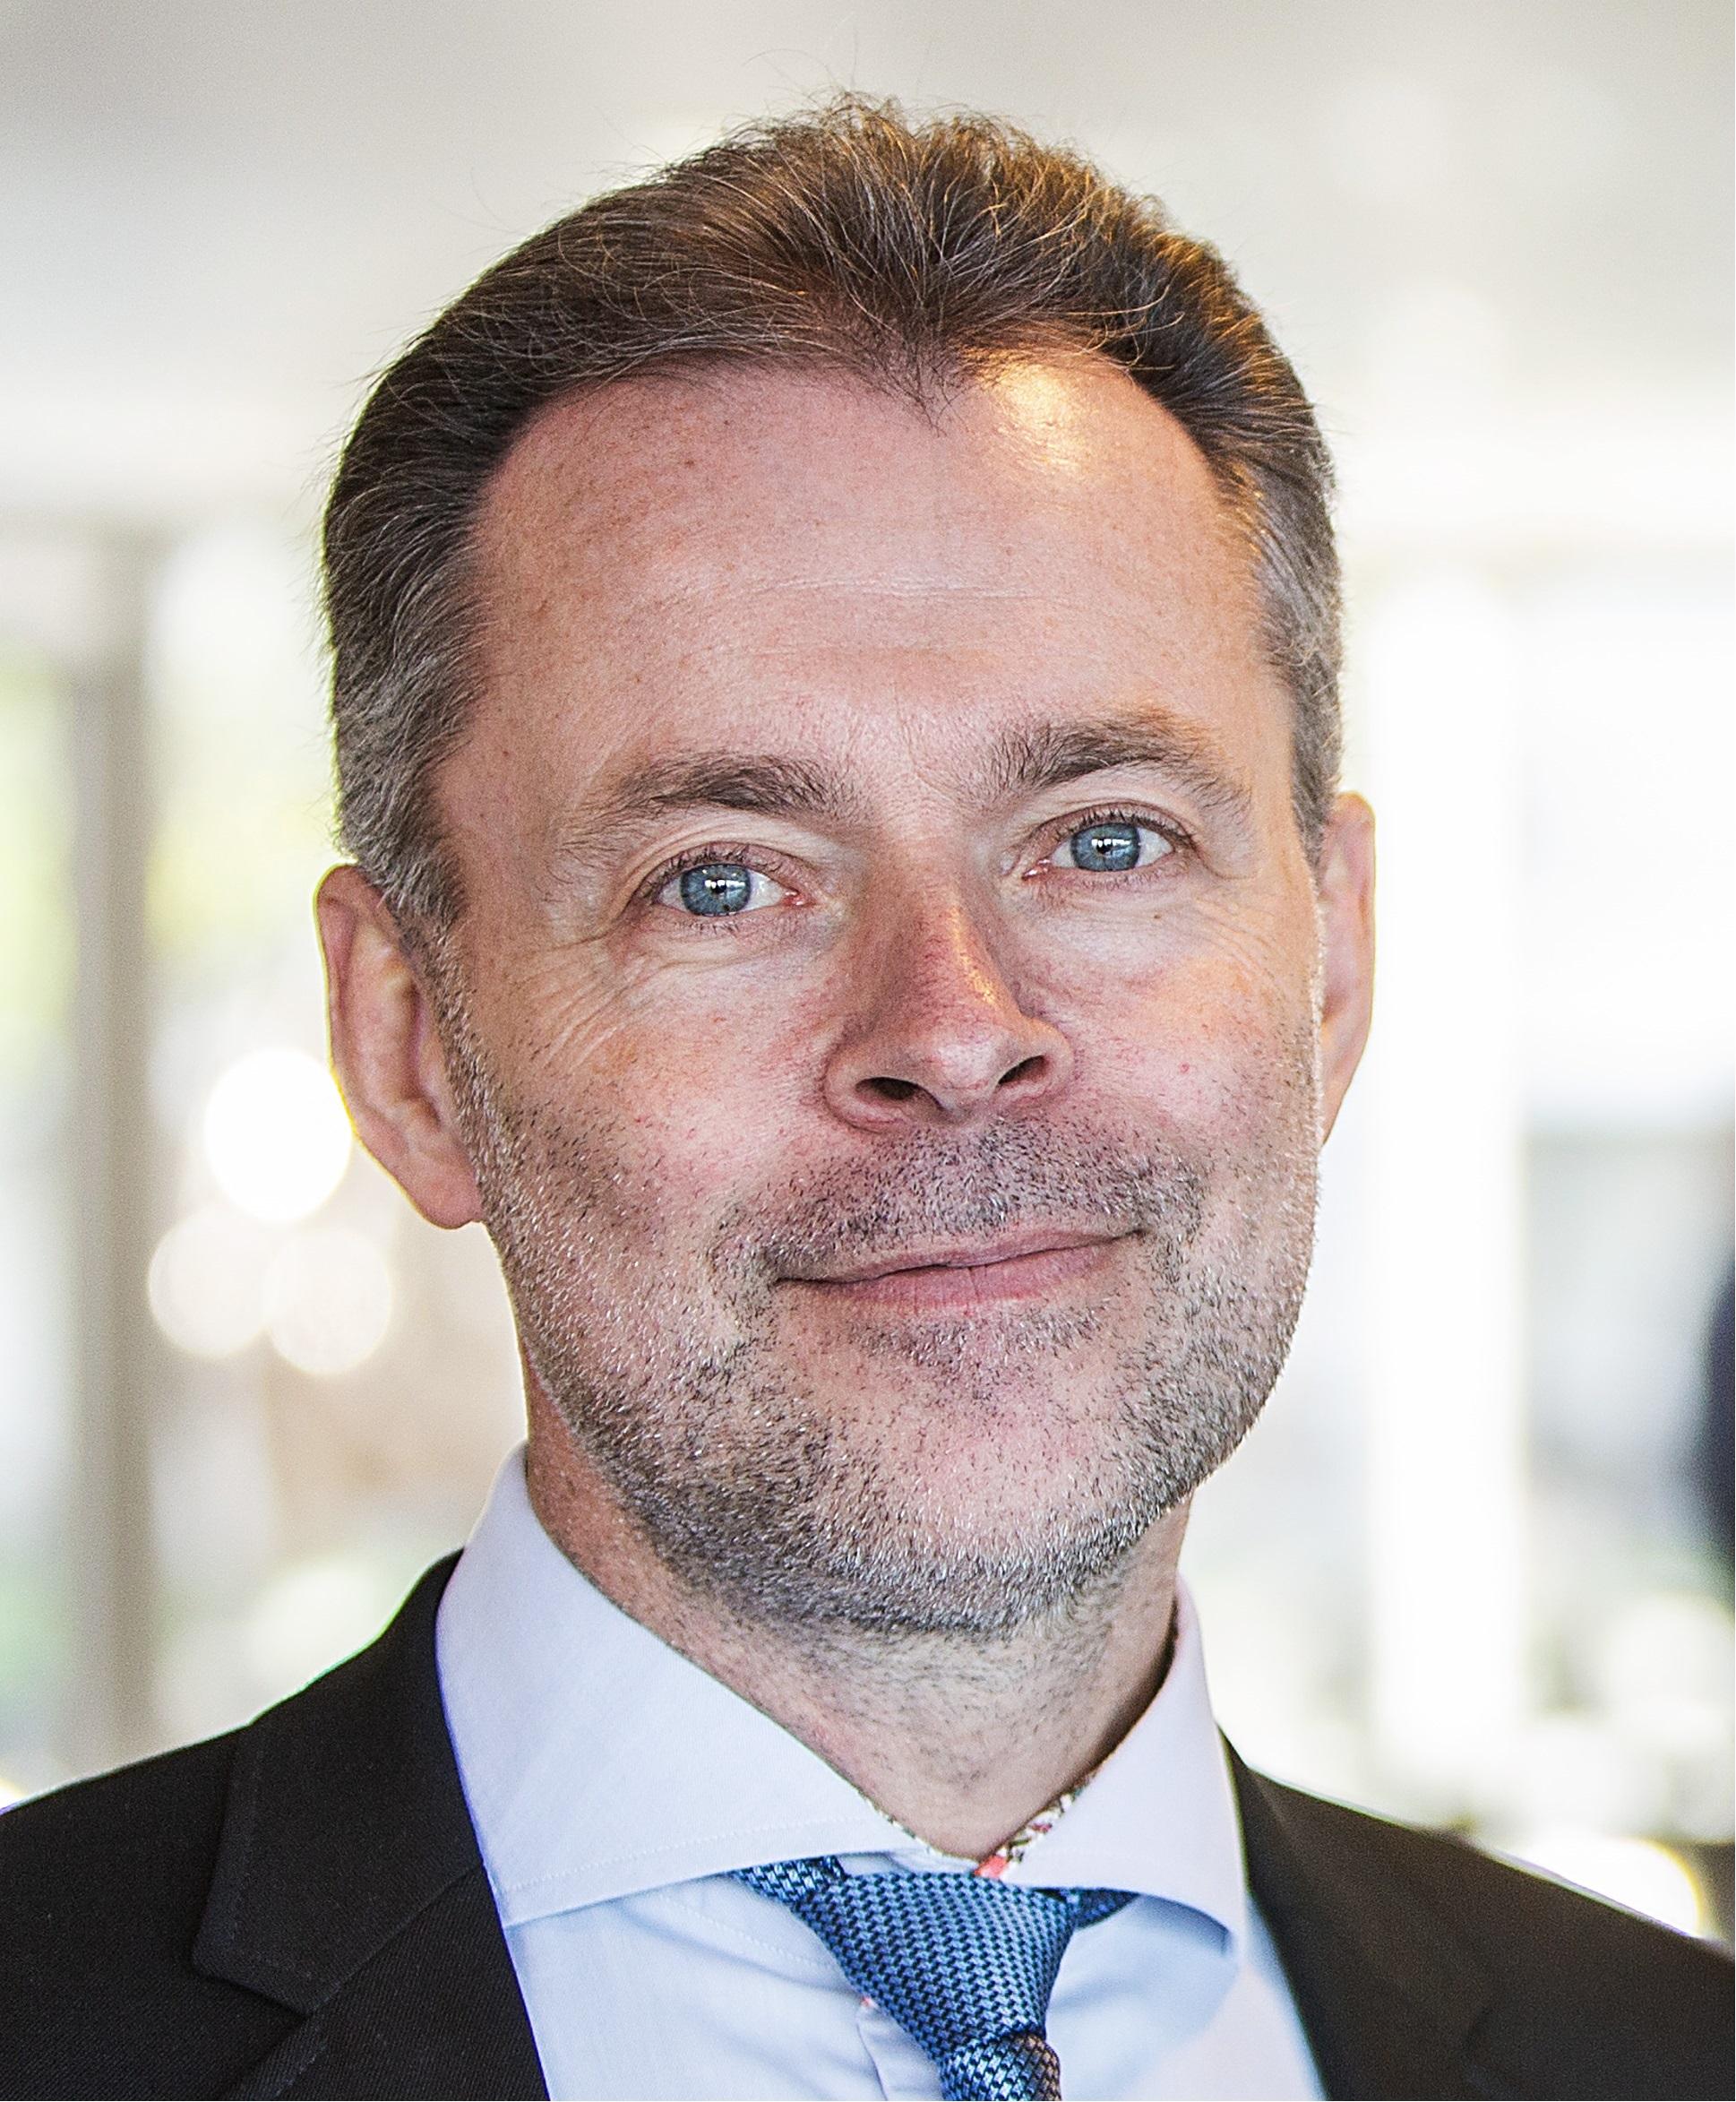 Erik Nordahl, United Fintech